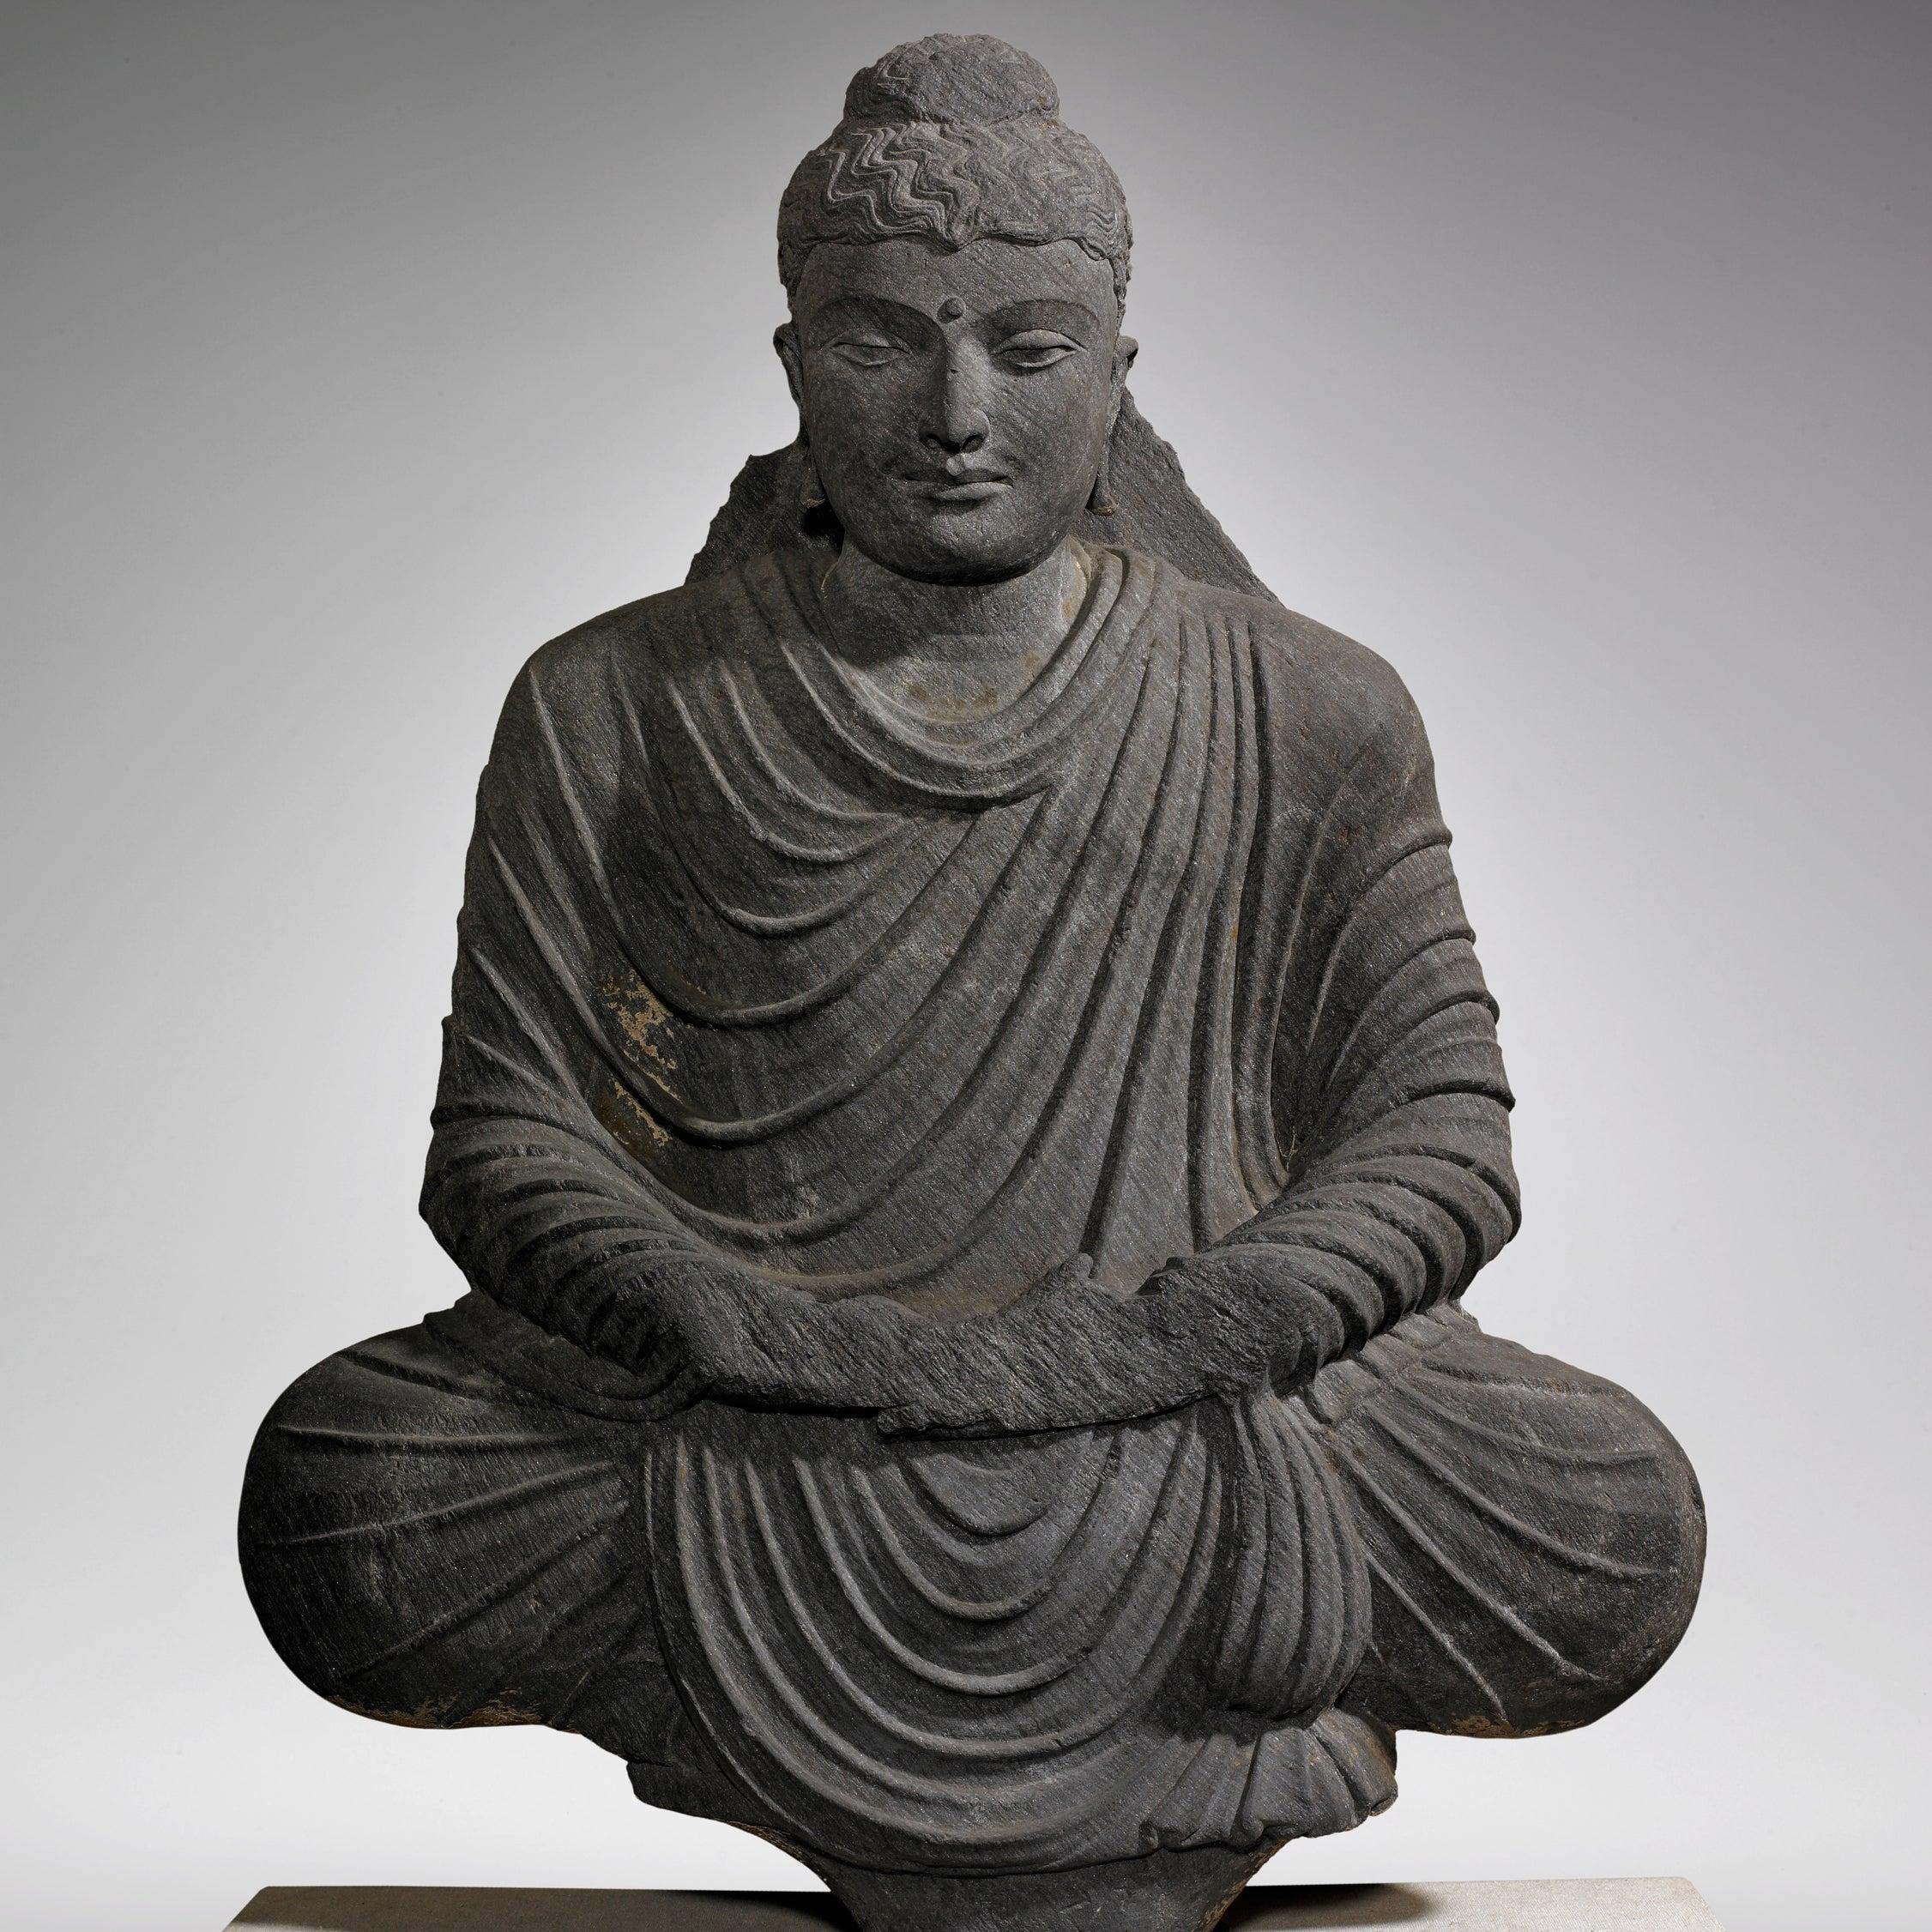 Seated Buddha in Meditation